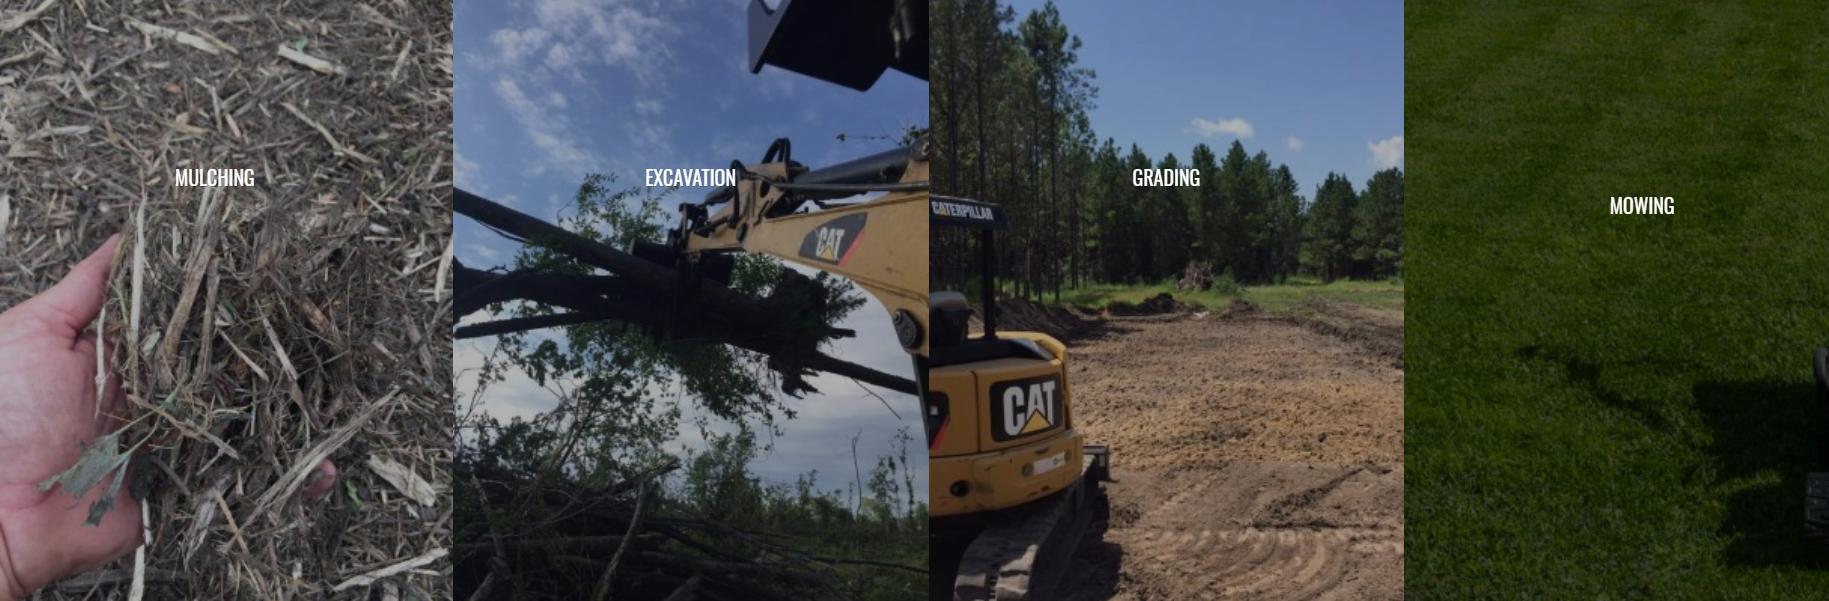 J. Harvey Excavating, LLC image 0